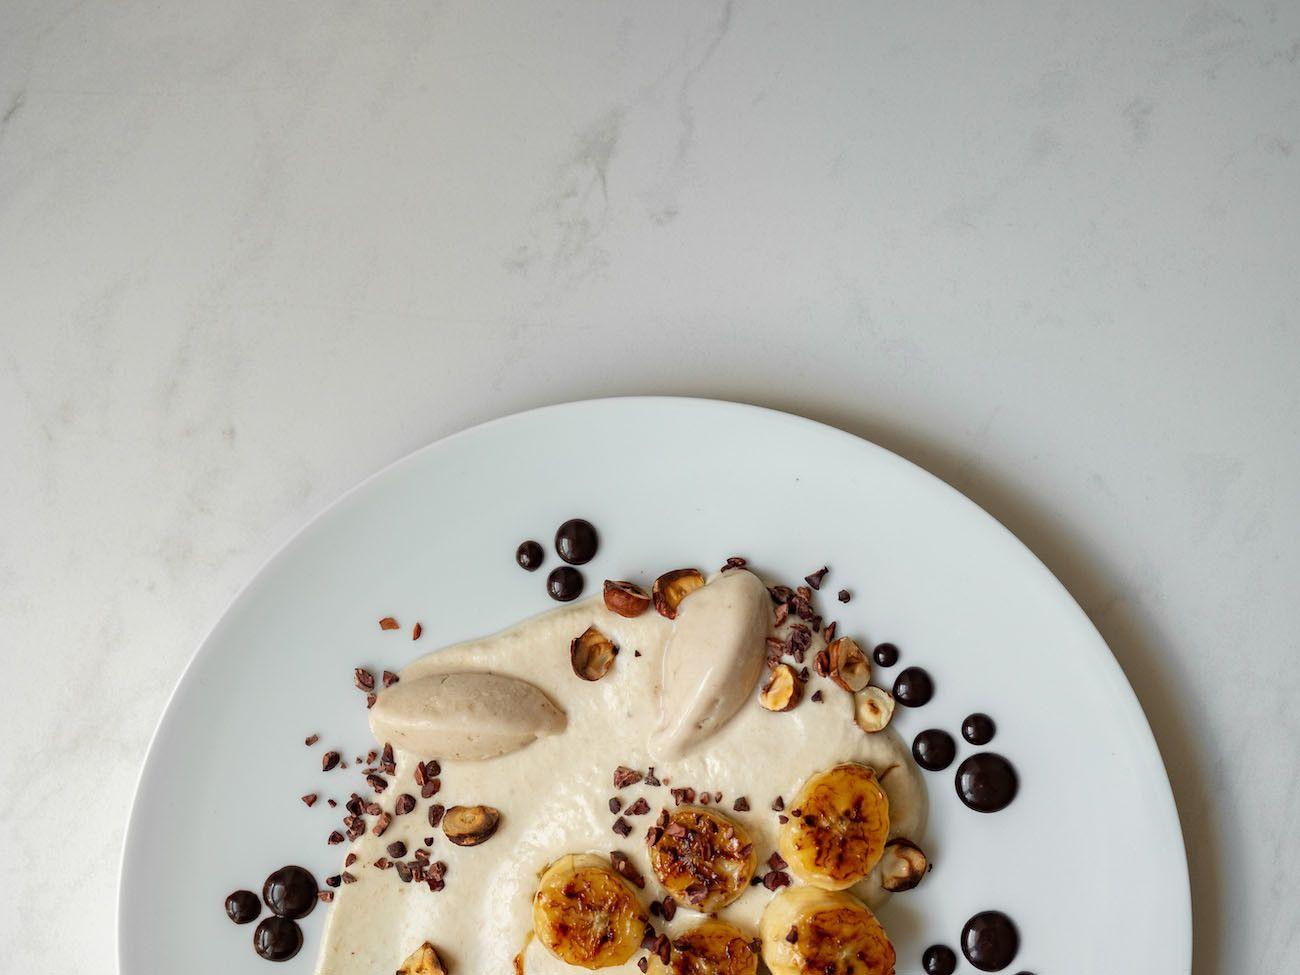 Foodblog, About Fuel, Rezept, Rum Bananen Dessert mit Hasenüssen und Schokoladen-Karamell, Kakao Nibs, Teller